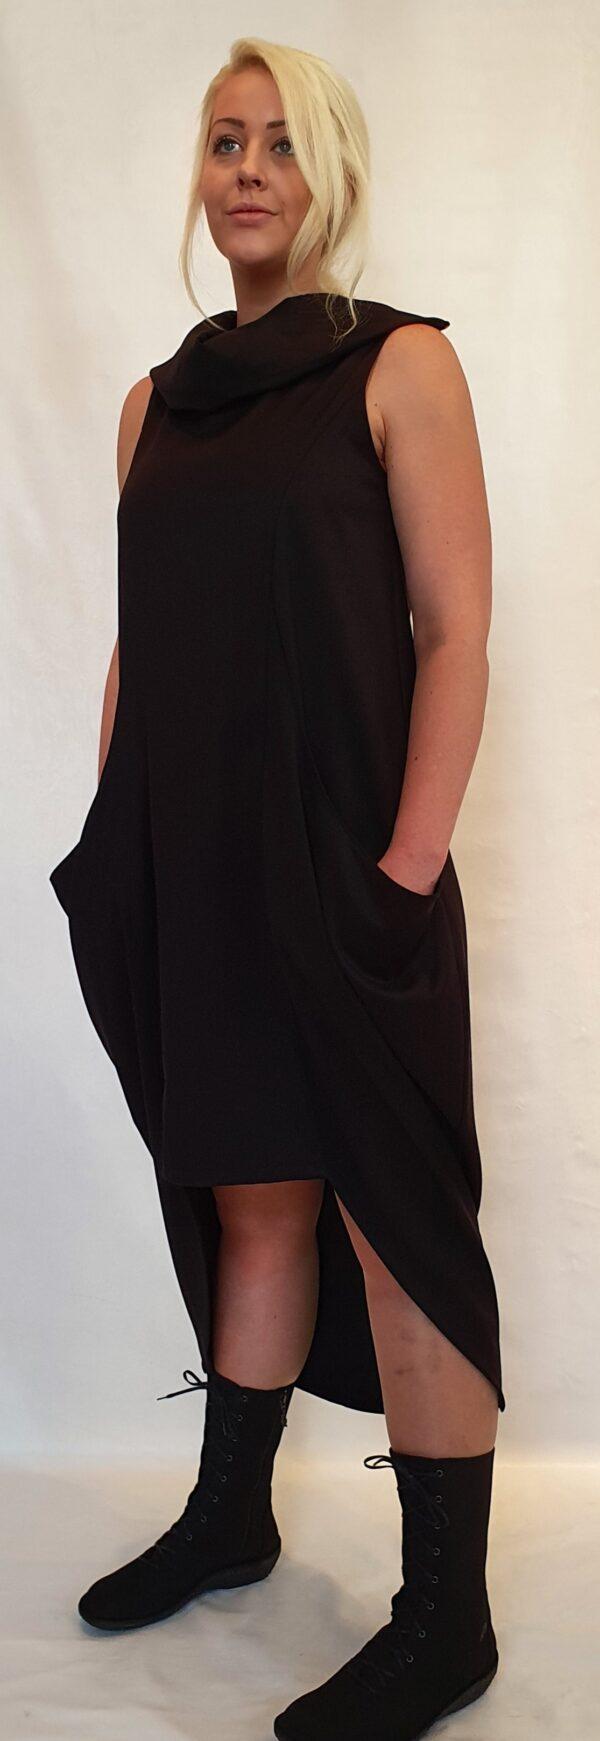 zwarte jurk van La Haine